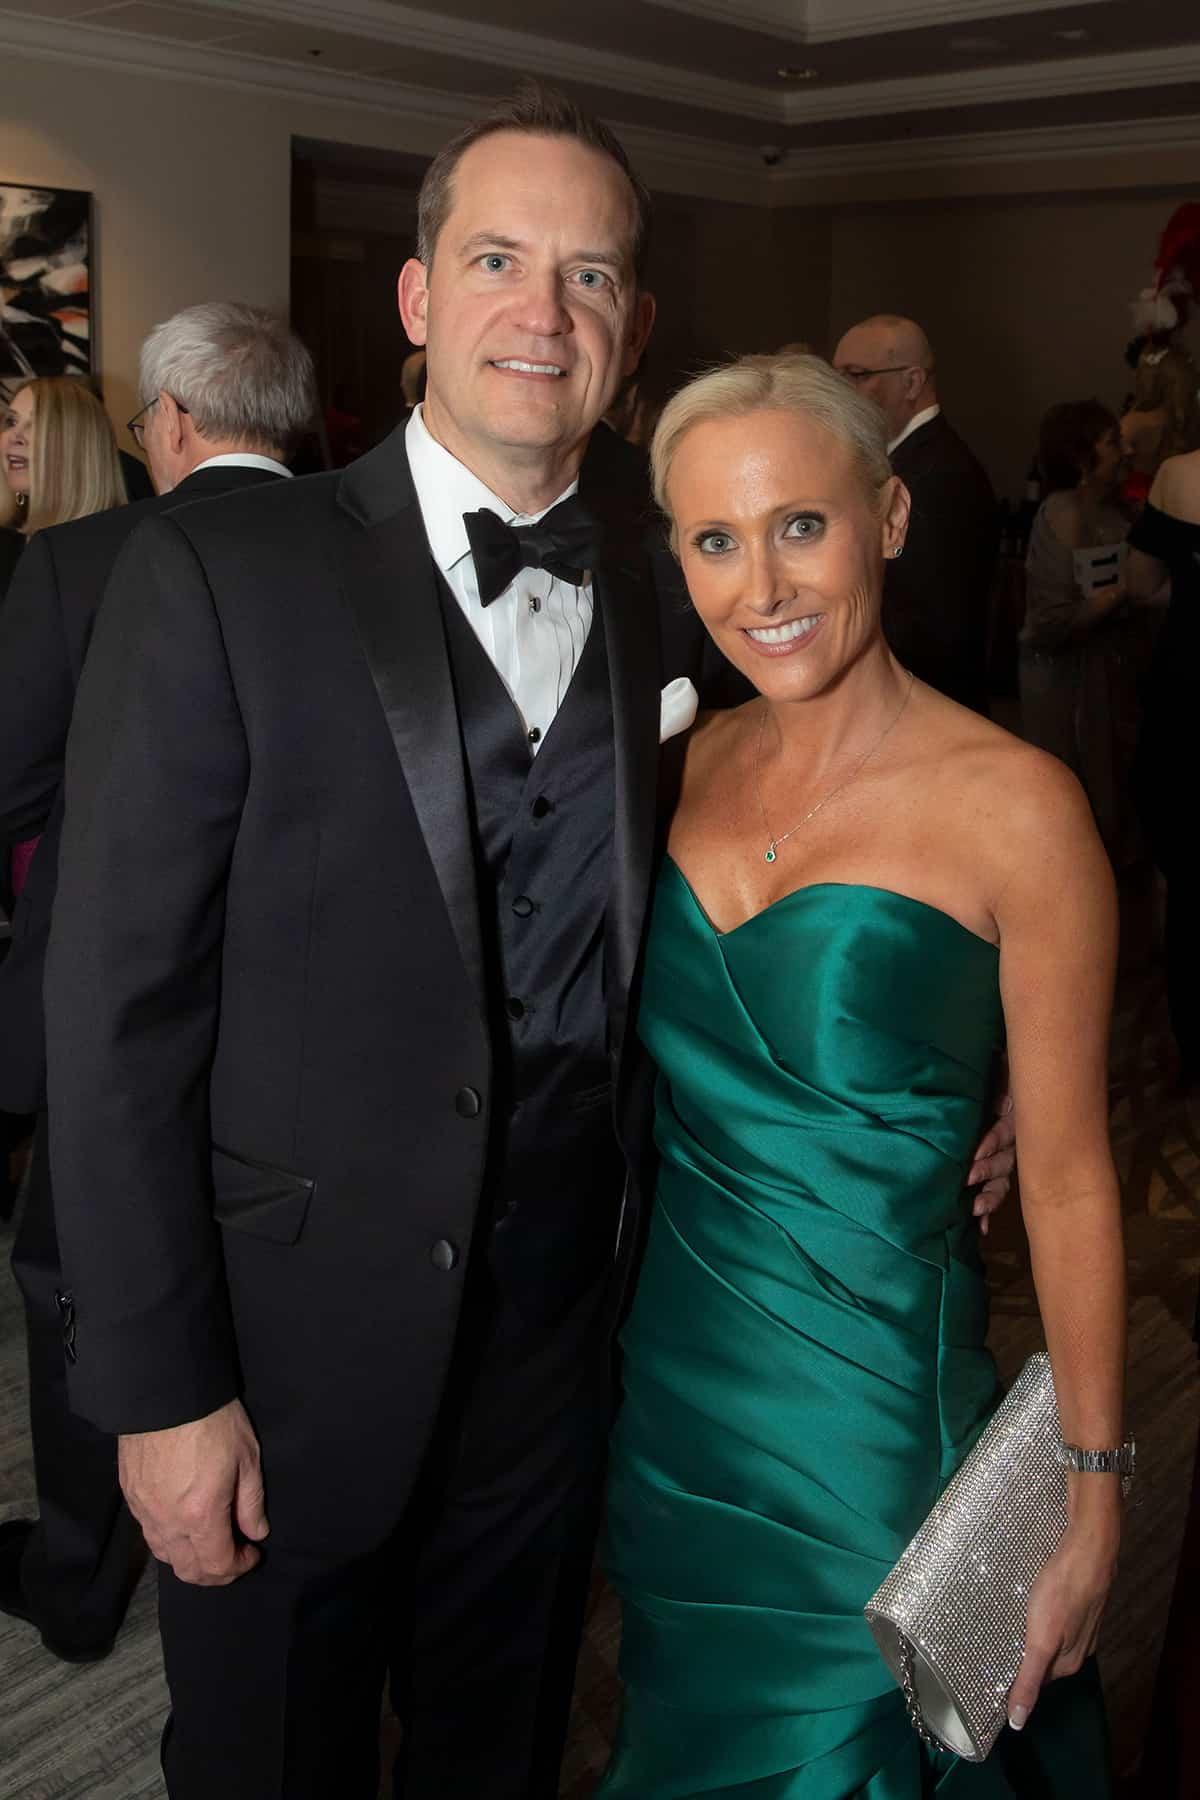 Chris and Jenn Ellerman